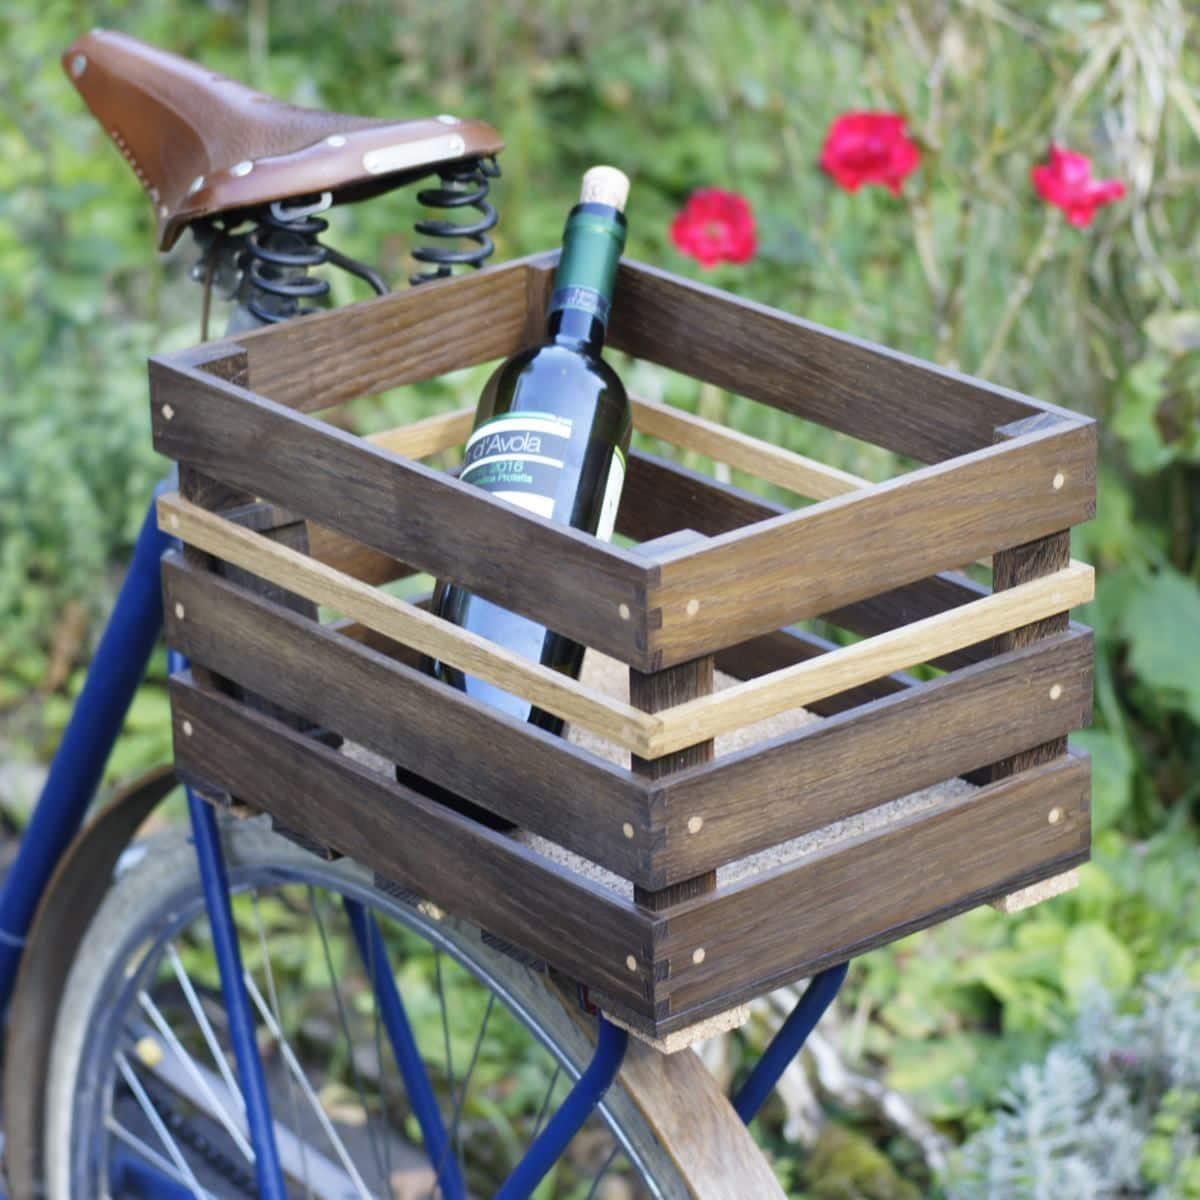 Fahrradkorb Fahrradkiste aus dunklem Eichenholz. Edles Design.